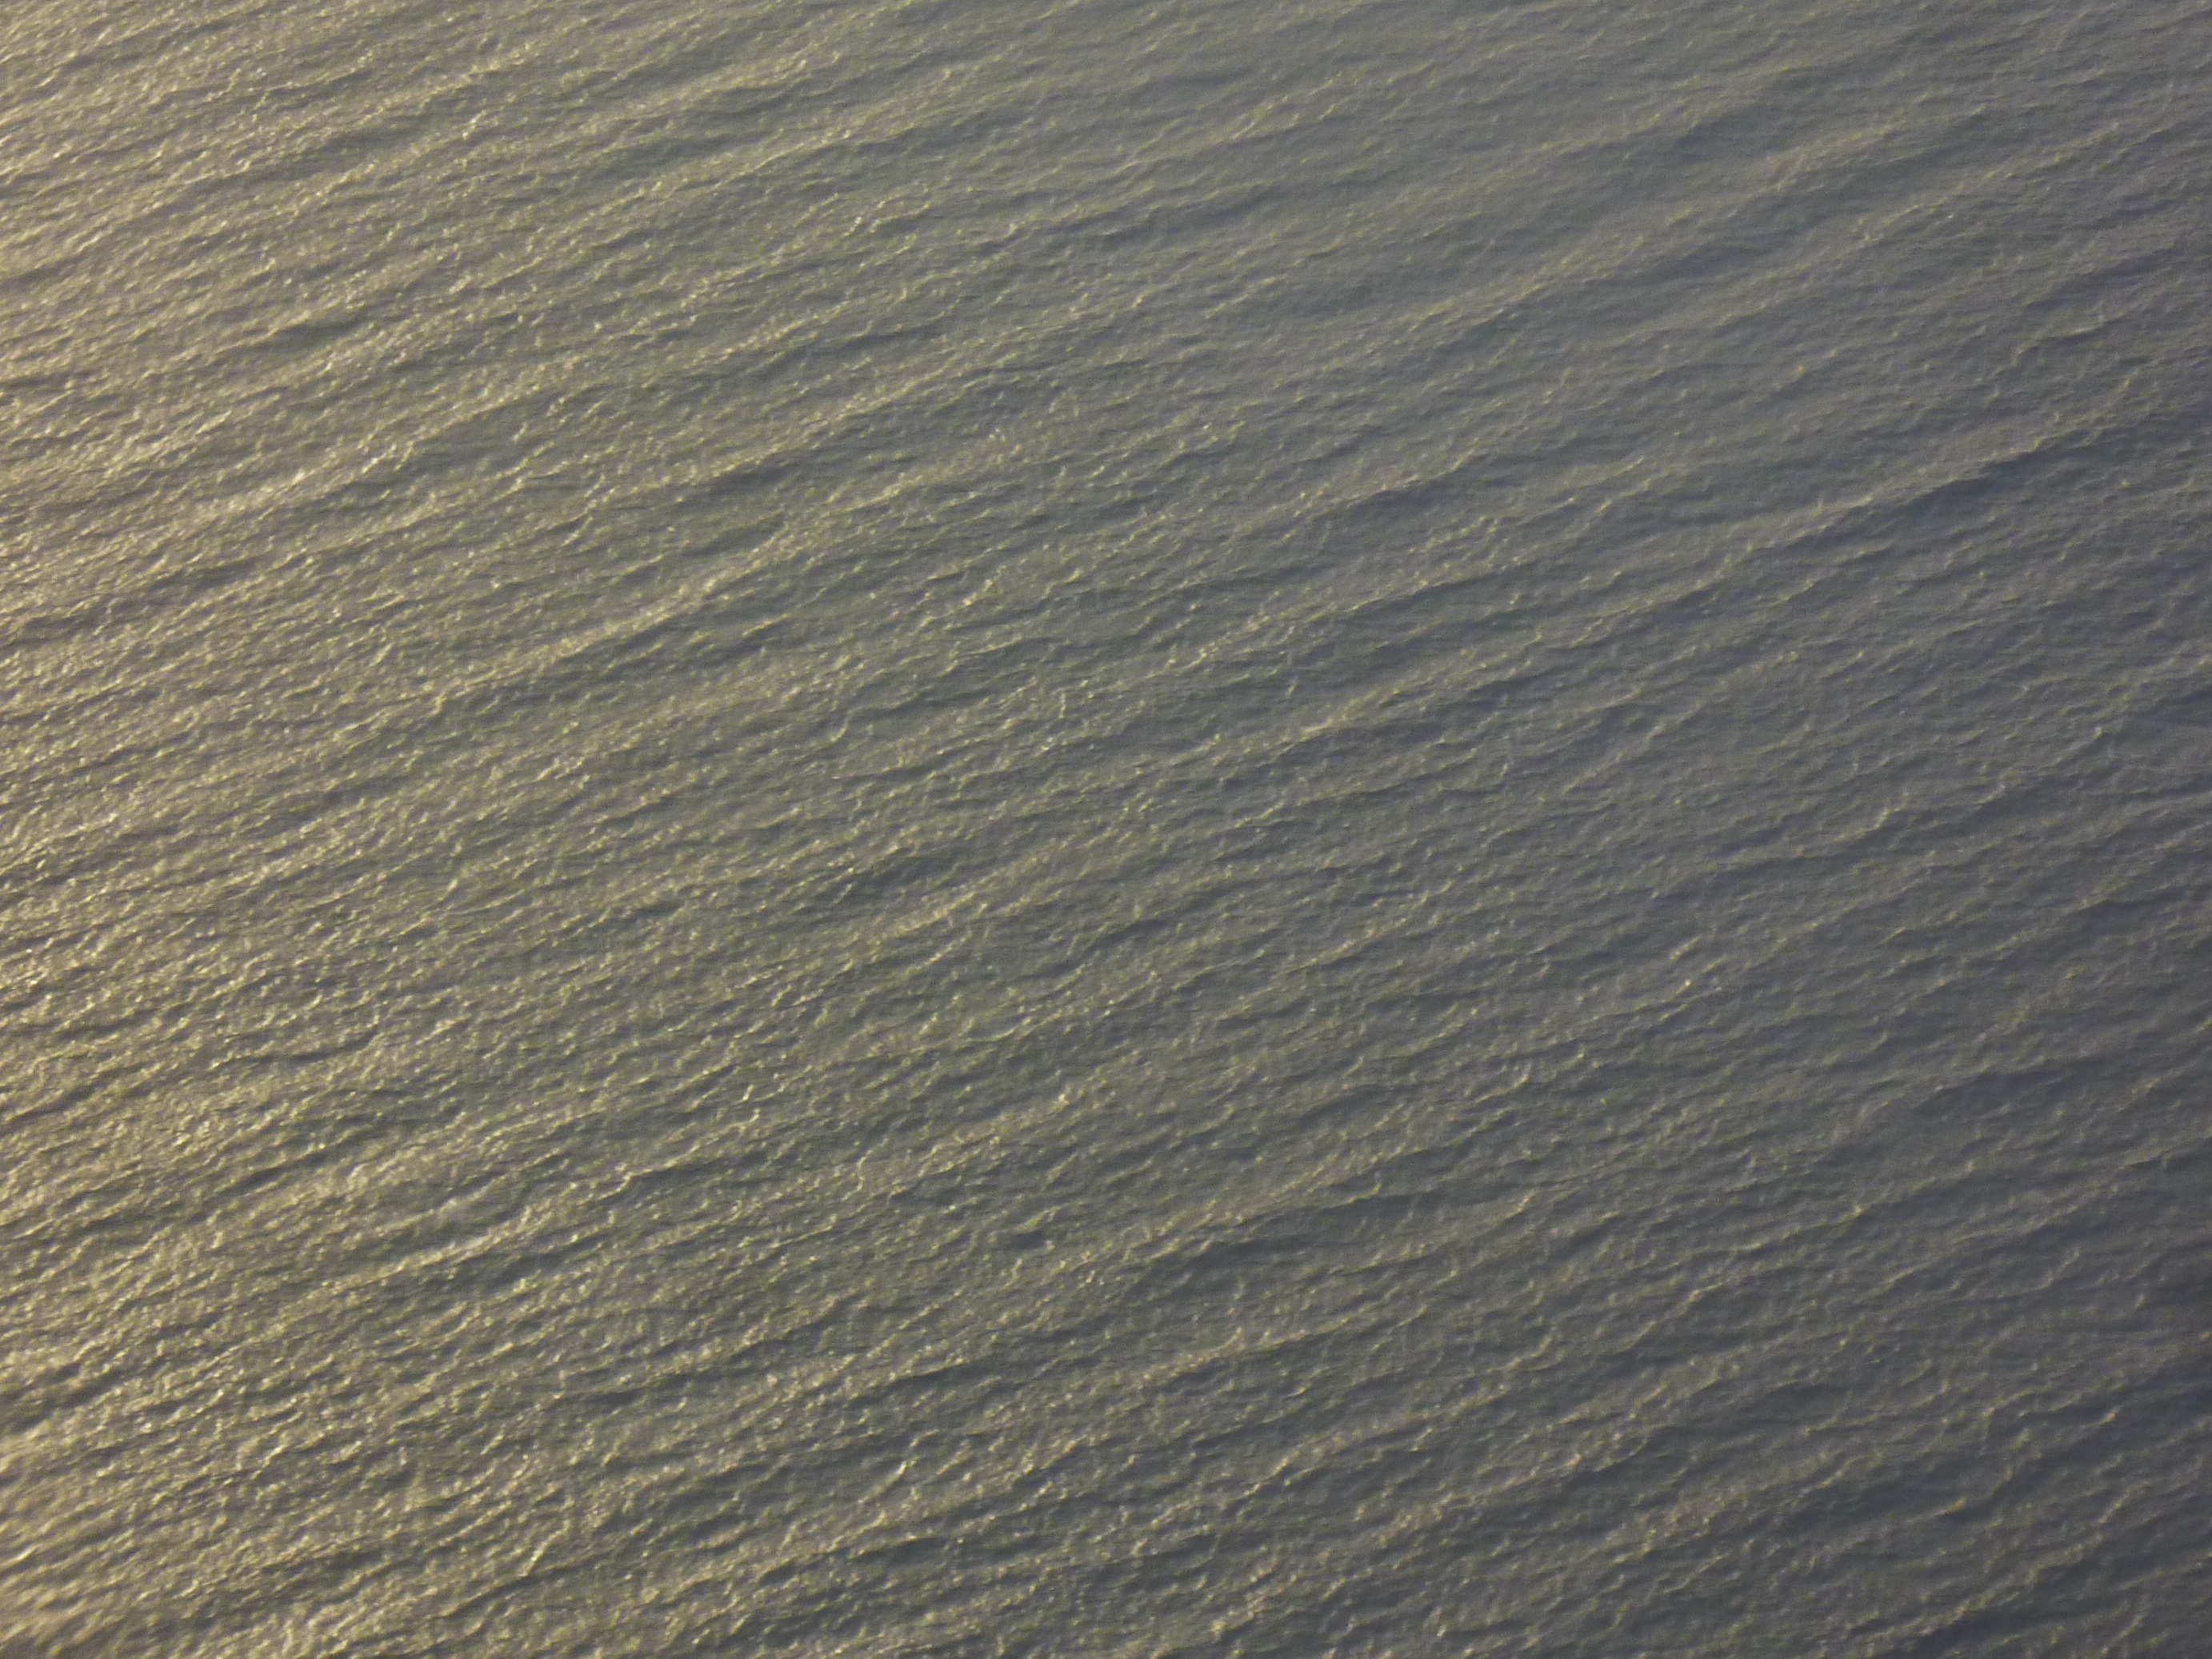 Water texture photo